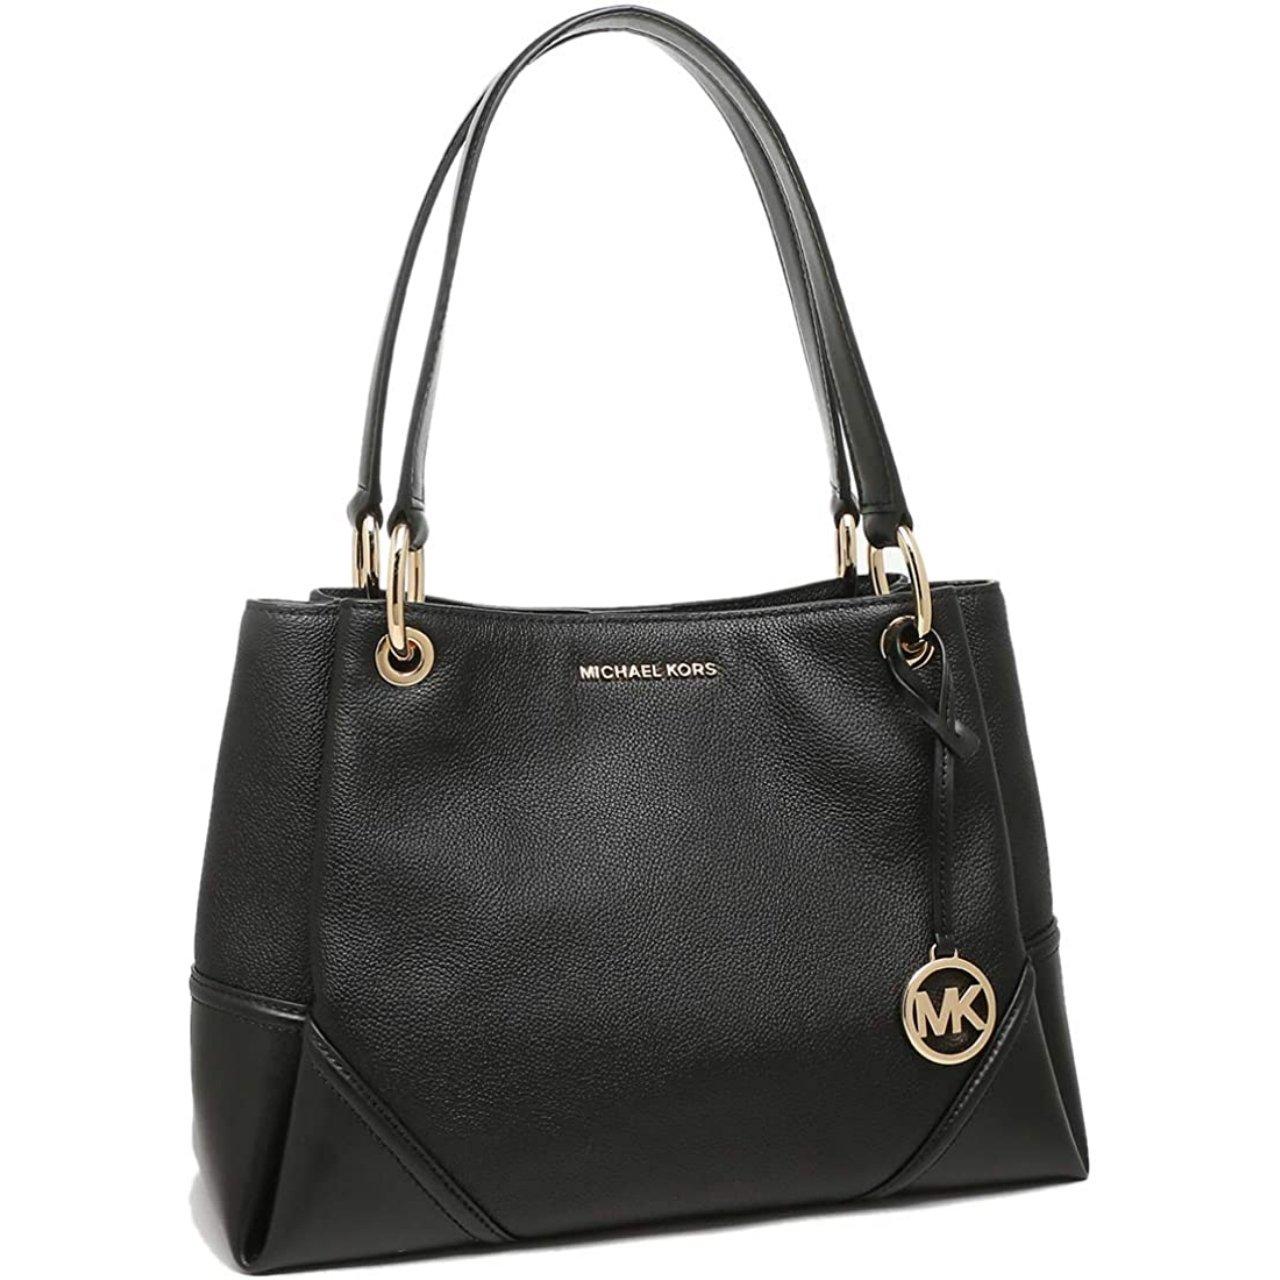 Michael Kors Women's Nicole Large Tote Bag Black MK30395